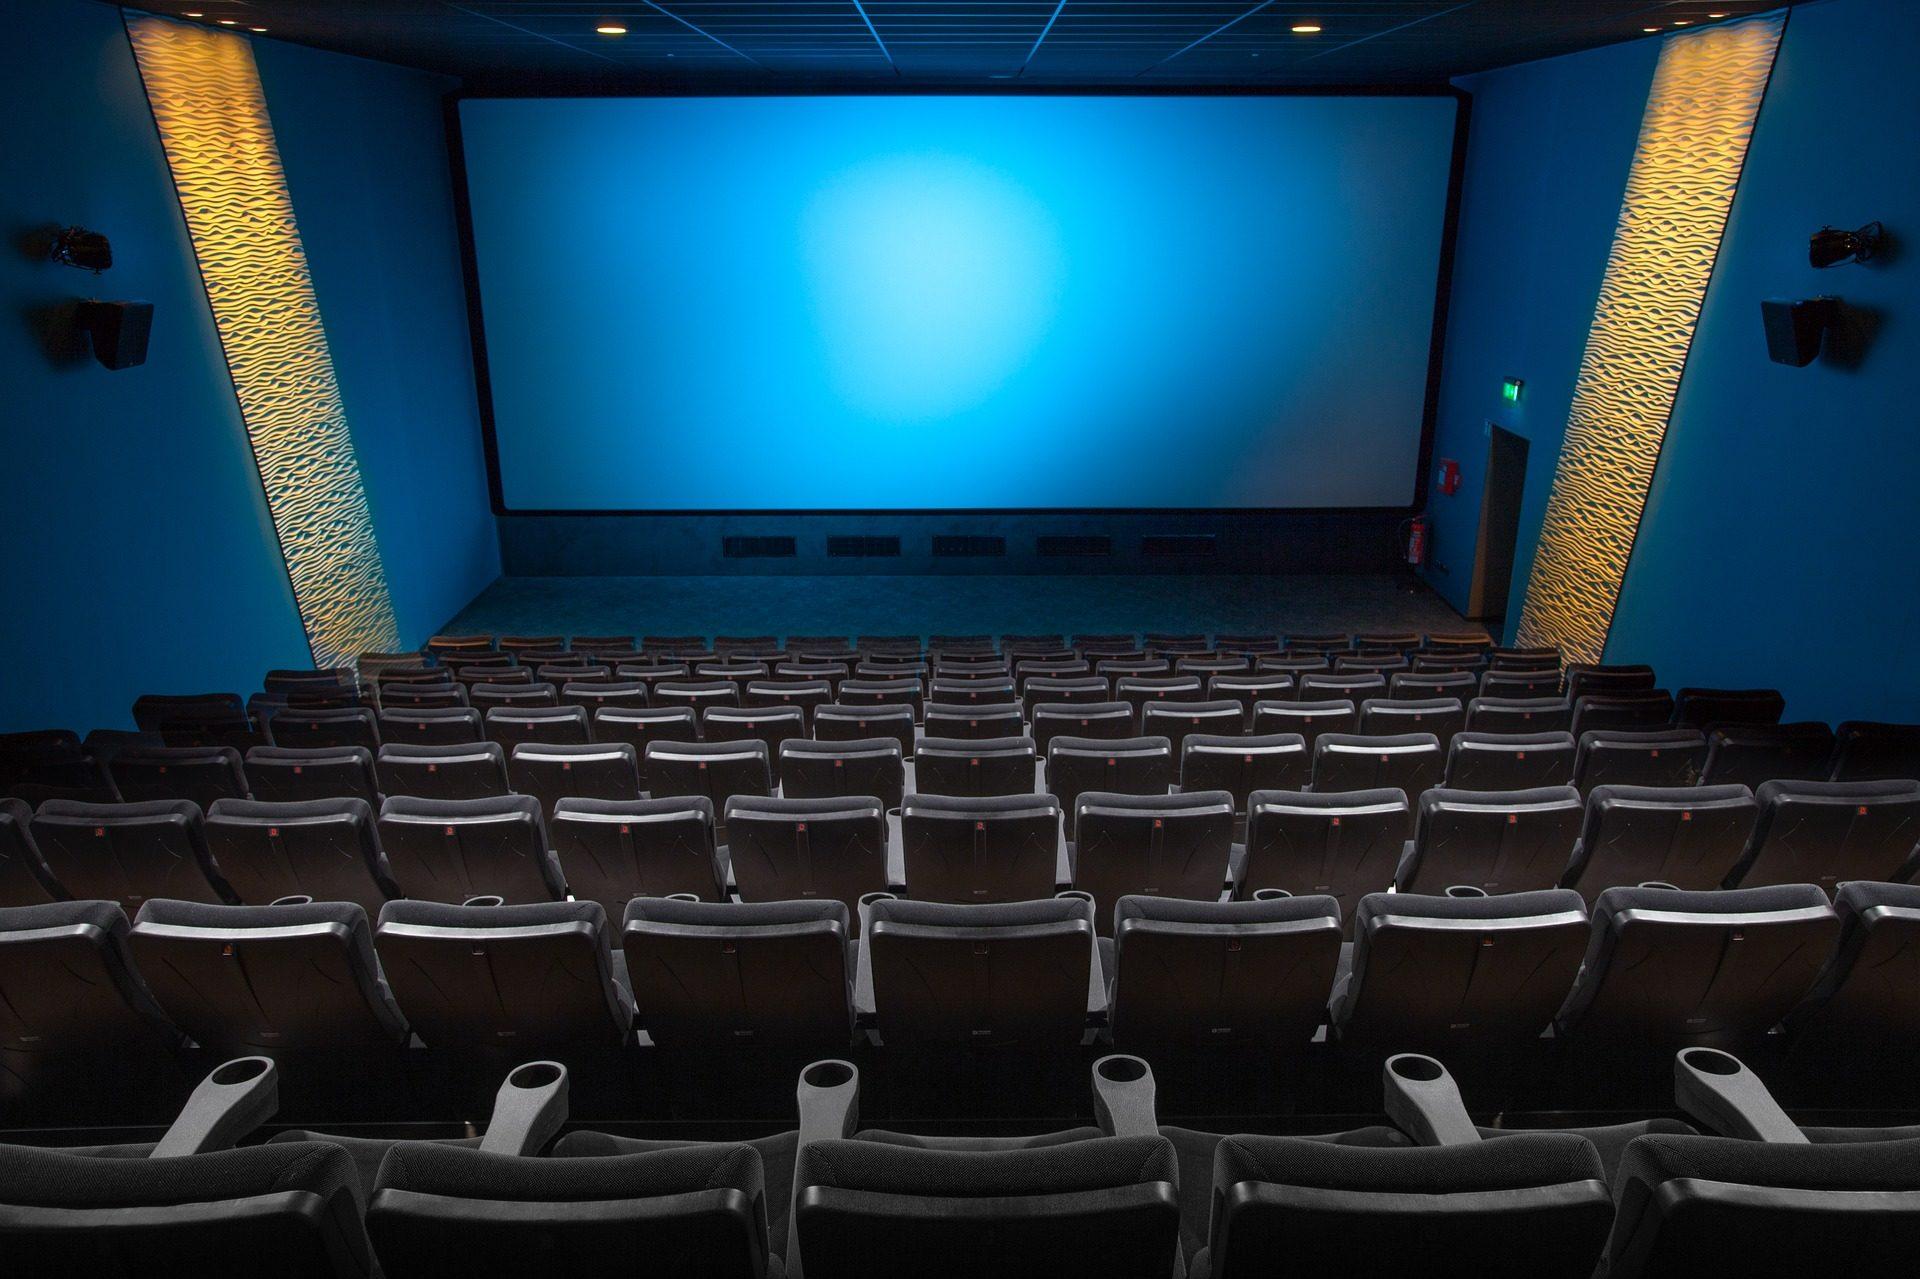 cinema-2502213_1920-9377742